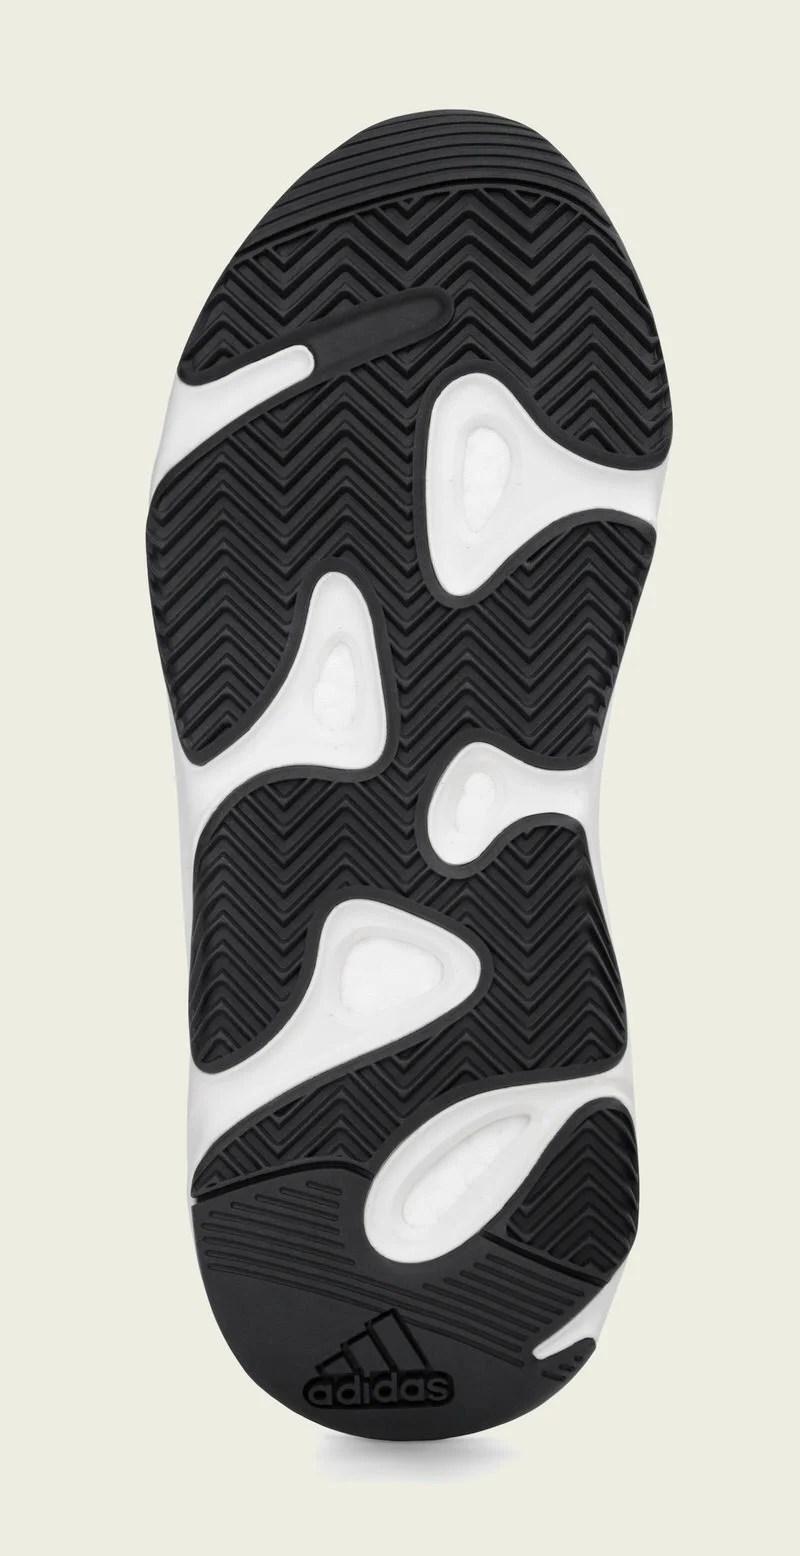 adidas Yeezy Boost 700 OG